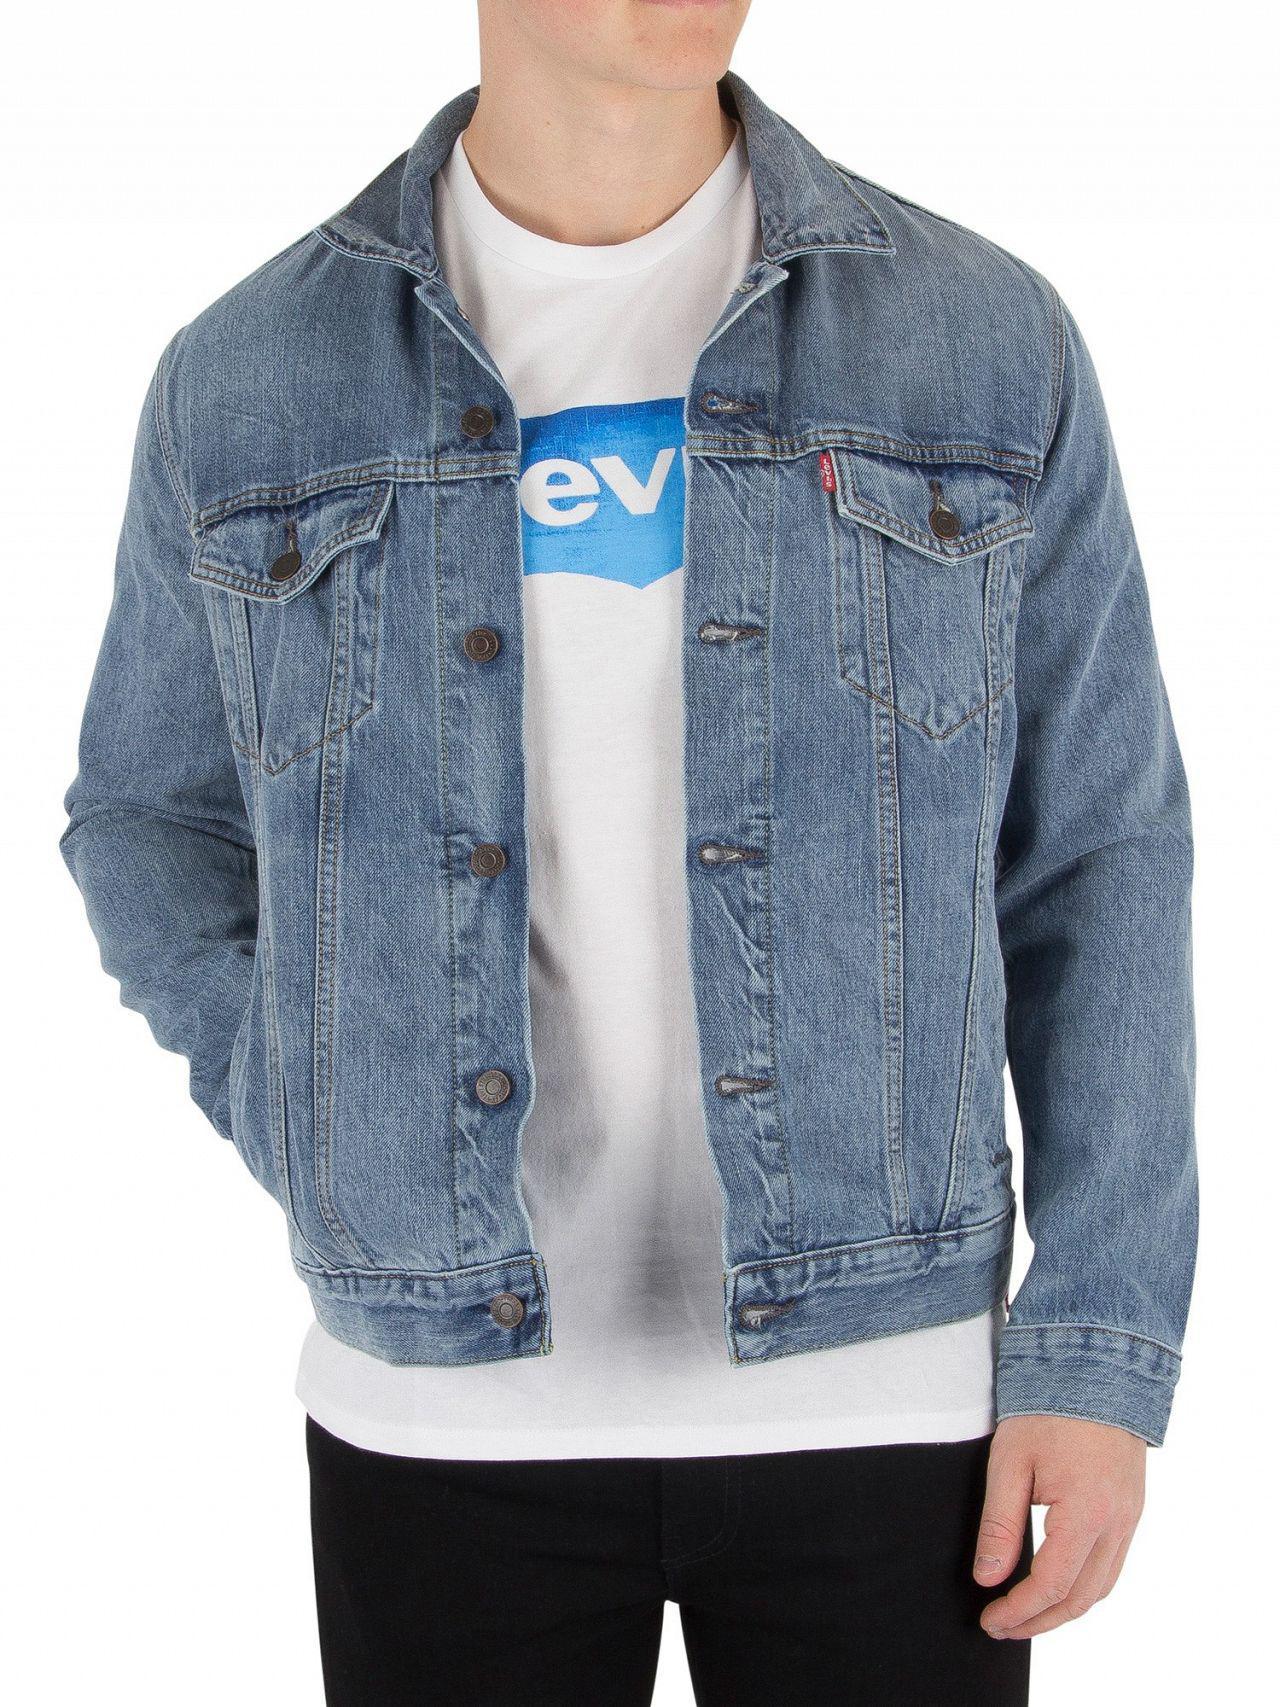 149f4c3d58dee Levi s Icy Trucker Jacket in Blue for Men - Lyst